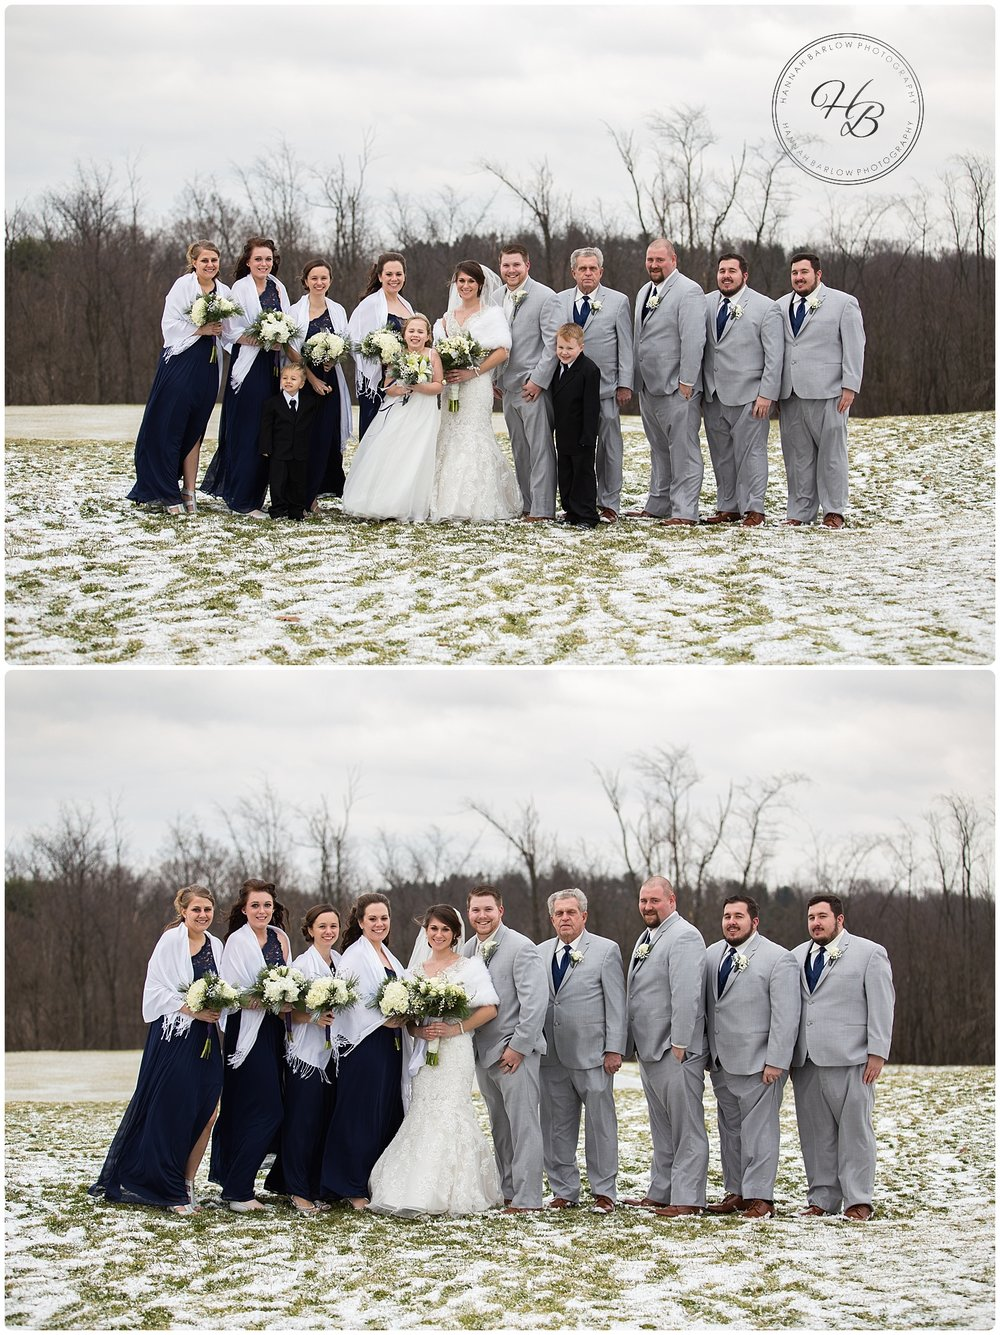 Wellsburg WV Winter Wedding Bridal Party